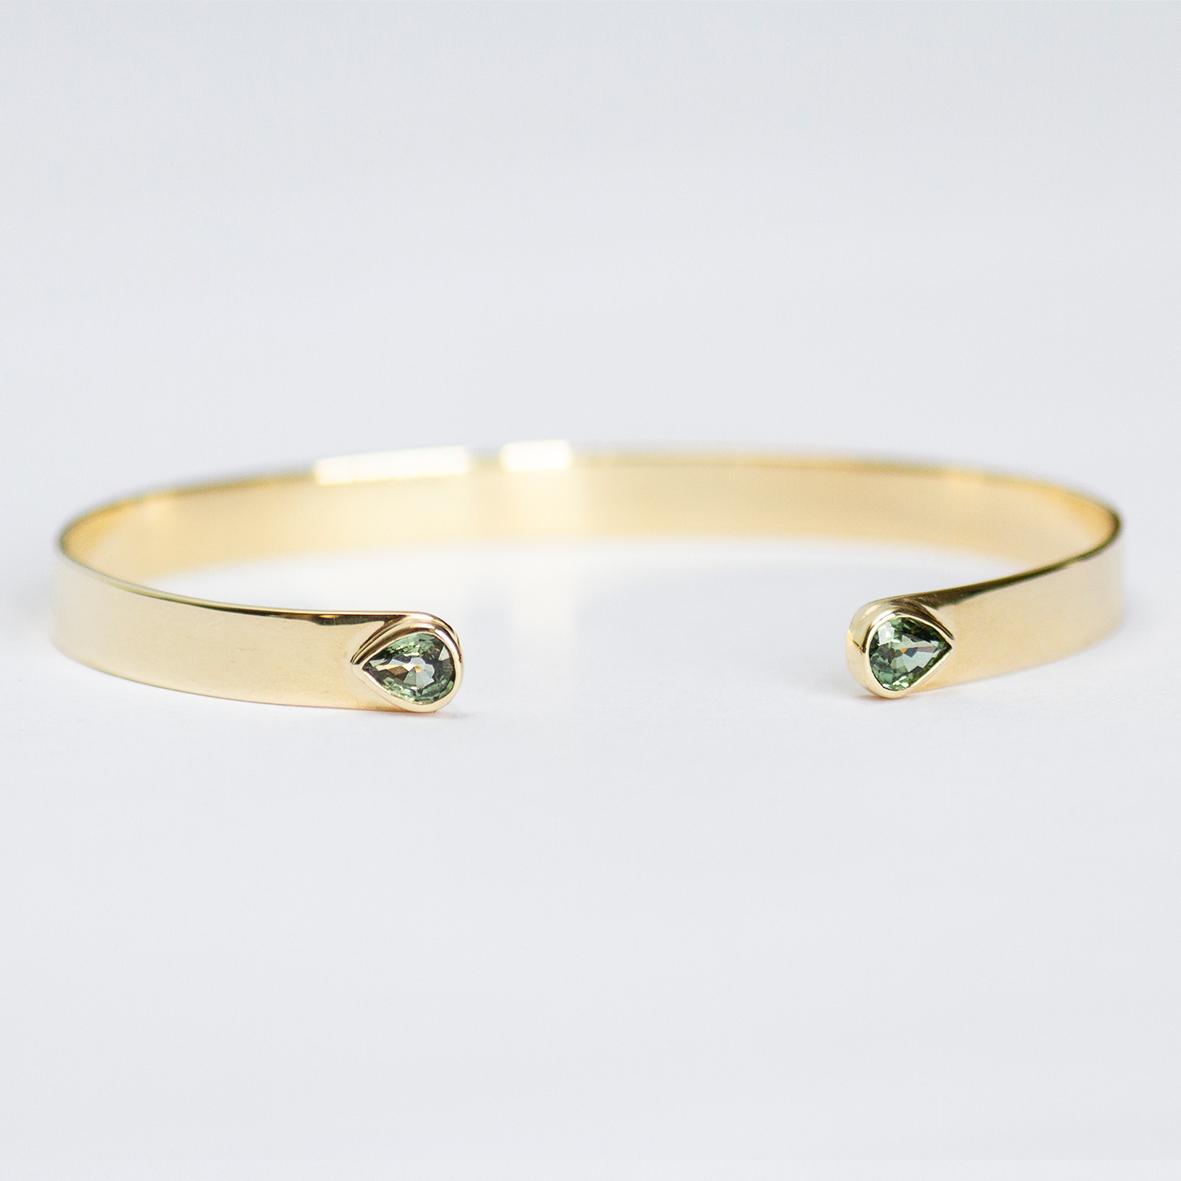 3. OONA_lotus_ficha1_flat sapphire bracelet